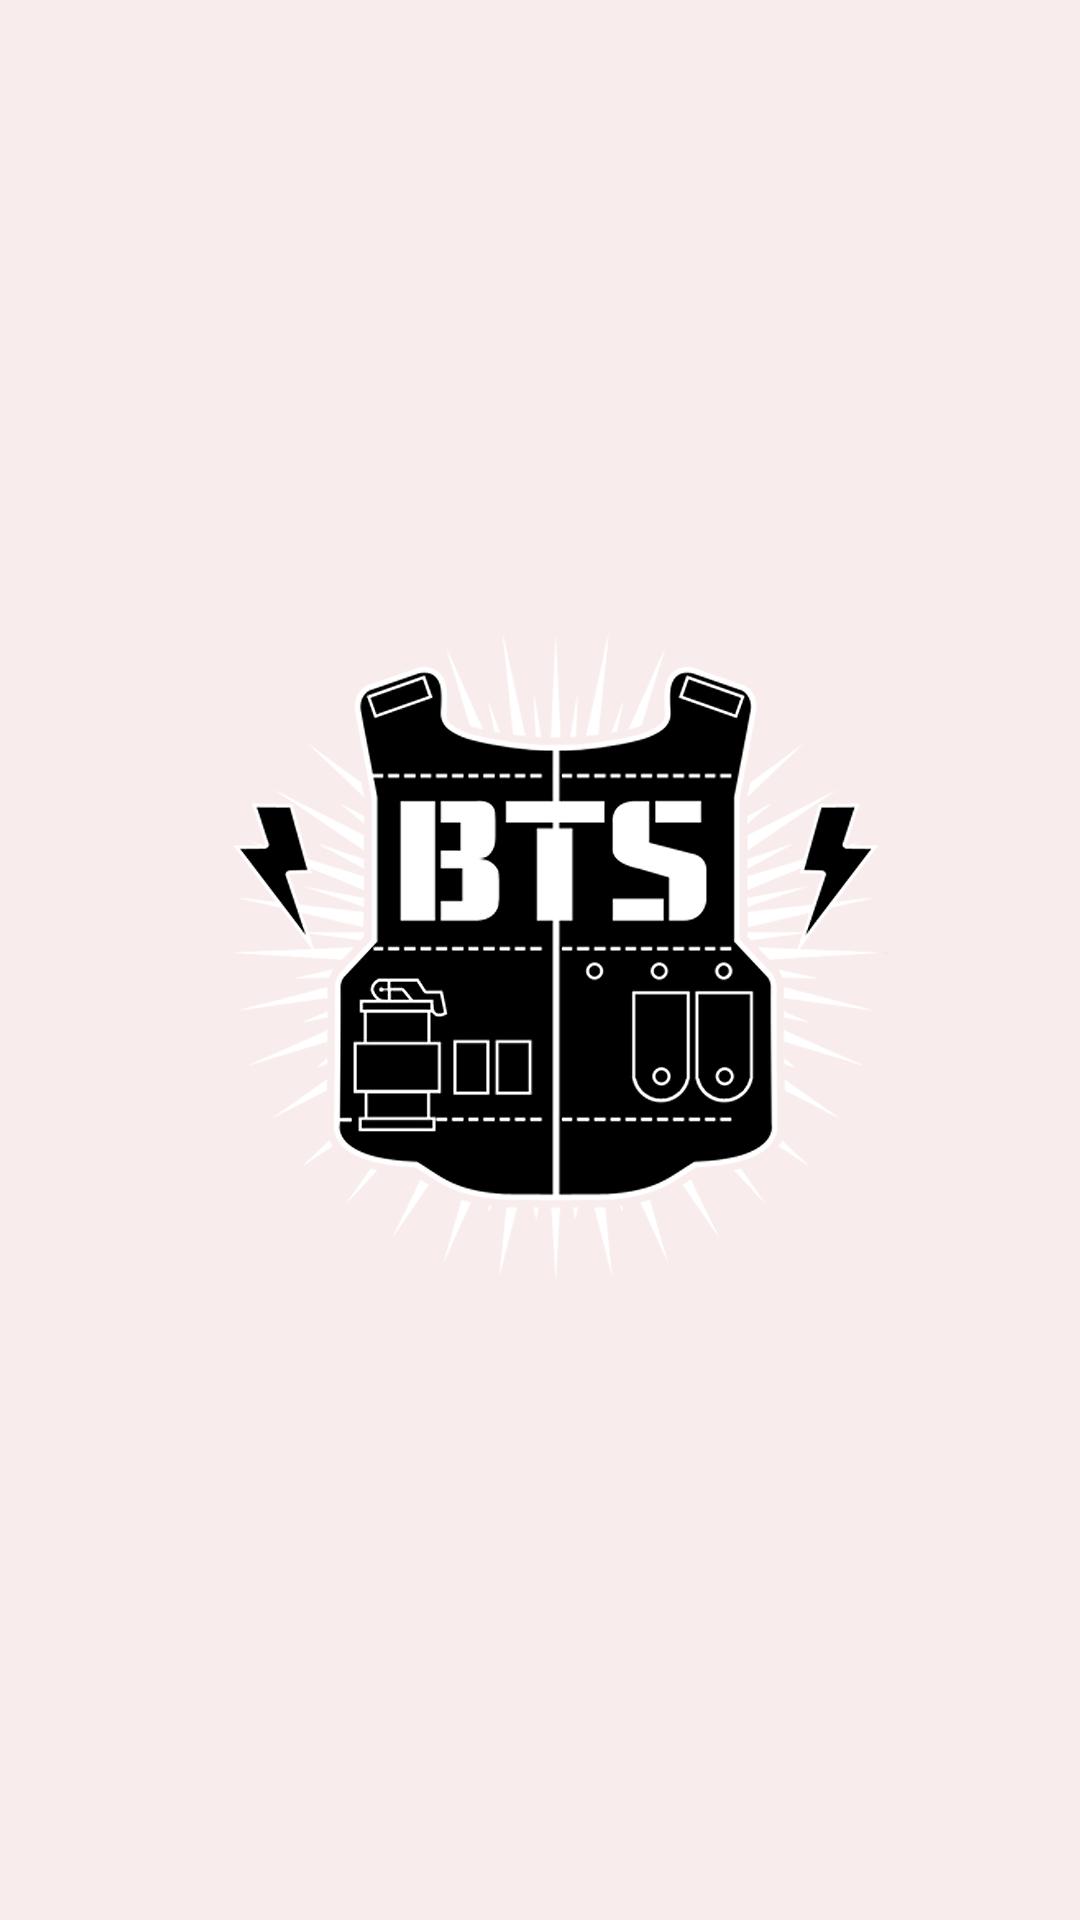 Kpop Miembro Tumblr Bts Logo Wwwmiifotoscom